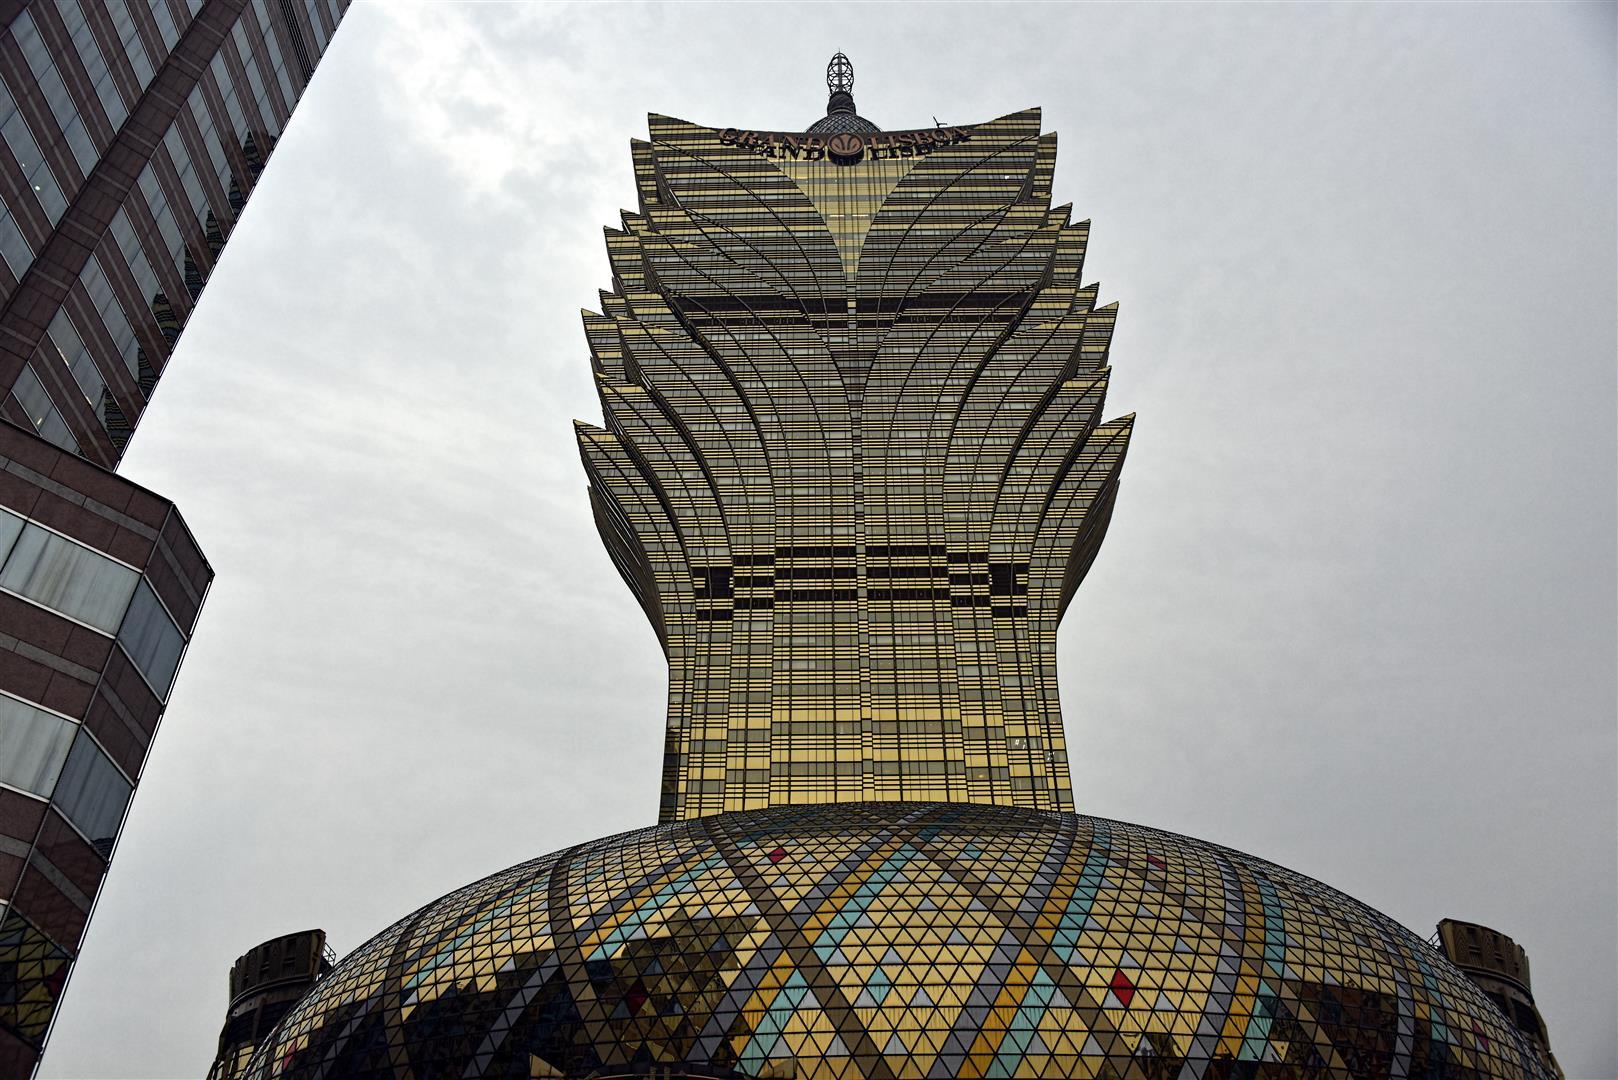 Lisboa - Macau (Large)